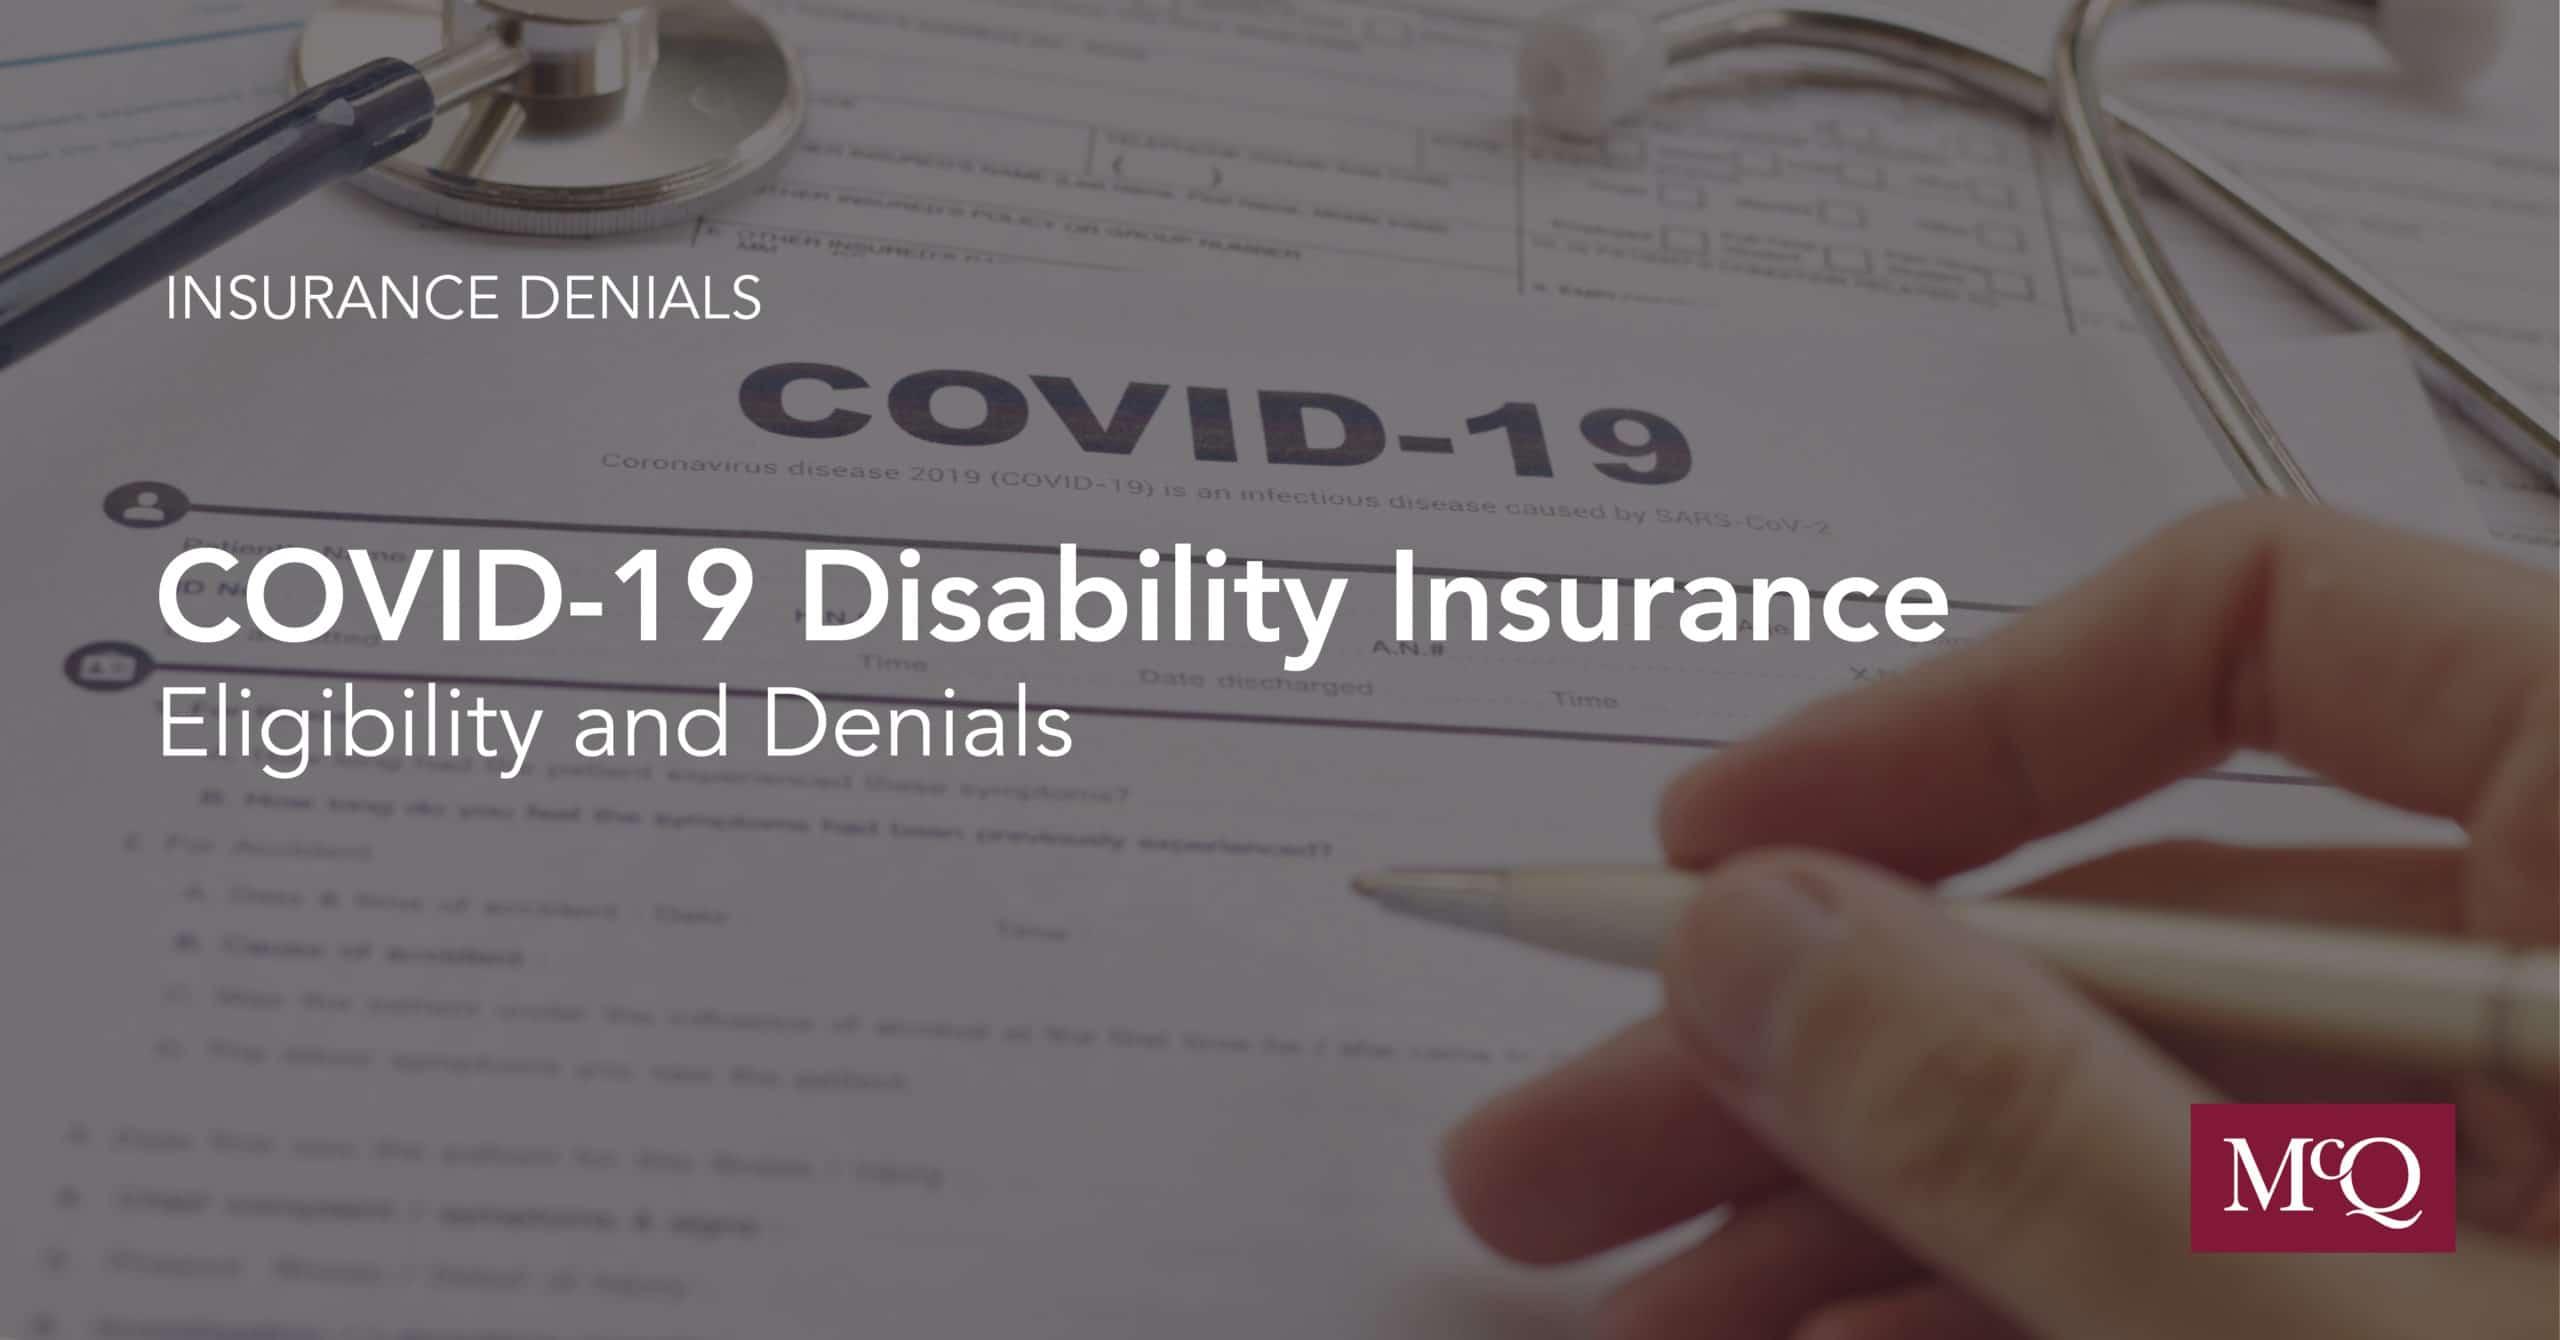 COVID-19 Disability Insurance Denial Lawyers